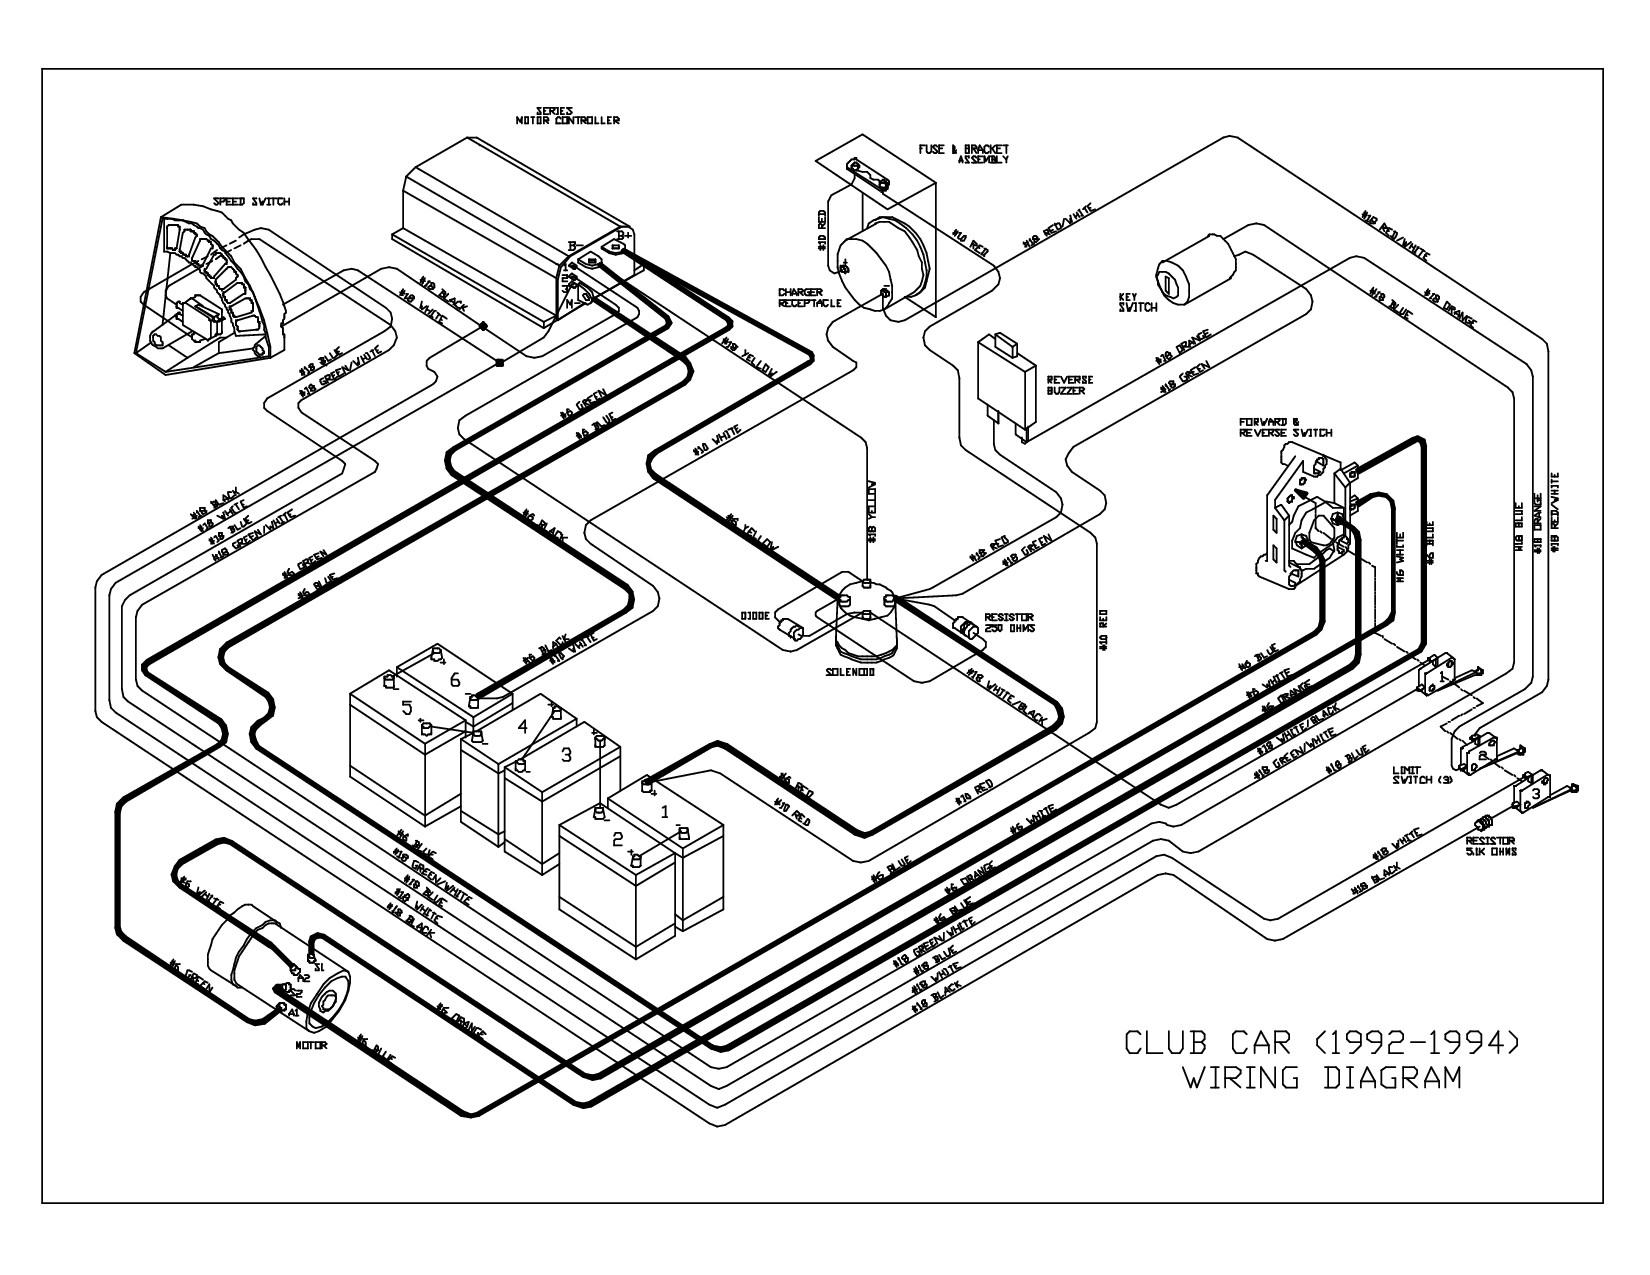 1994 honda accord engine diagram automotive wiring diagram 1992 honda accord wiring diagram speed of 1994